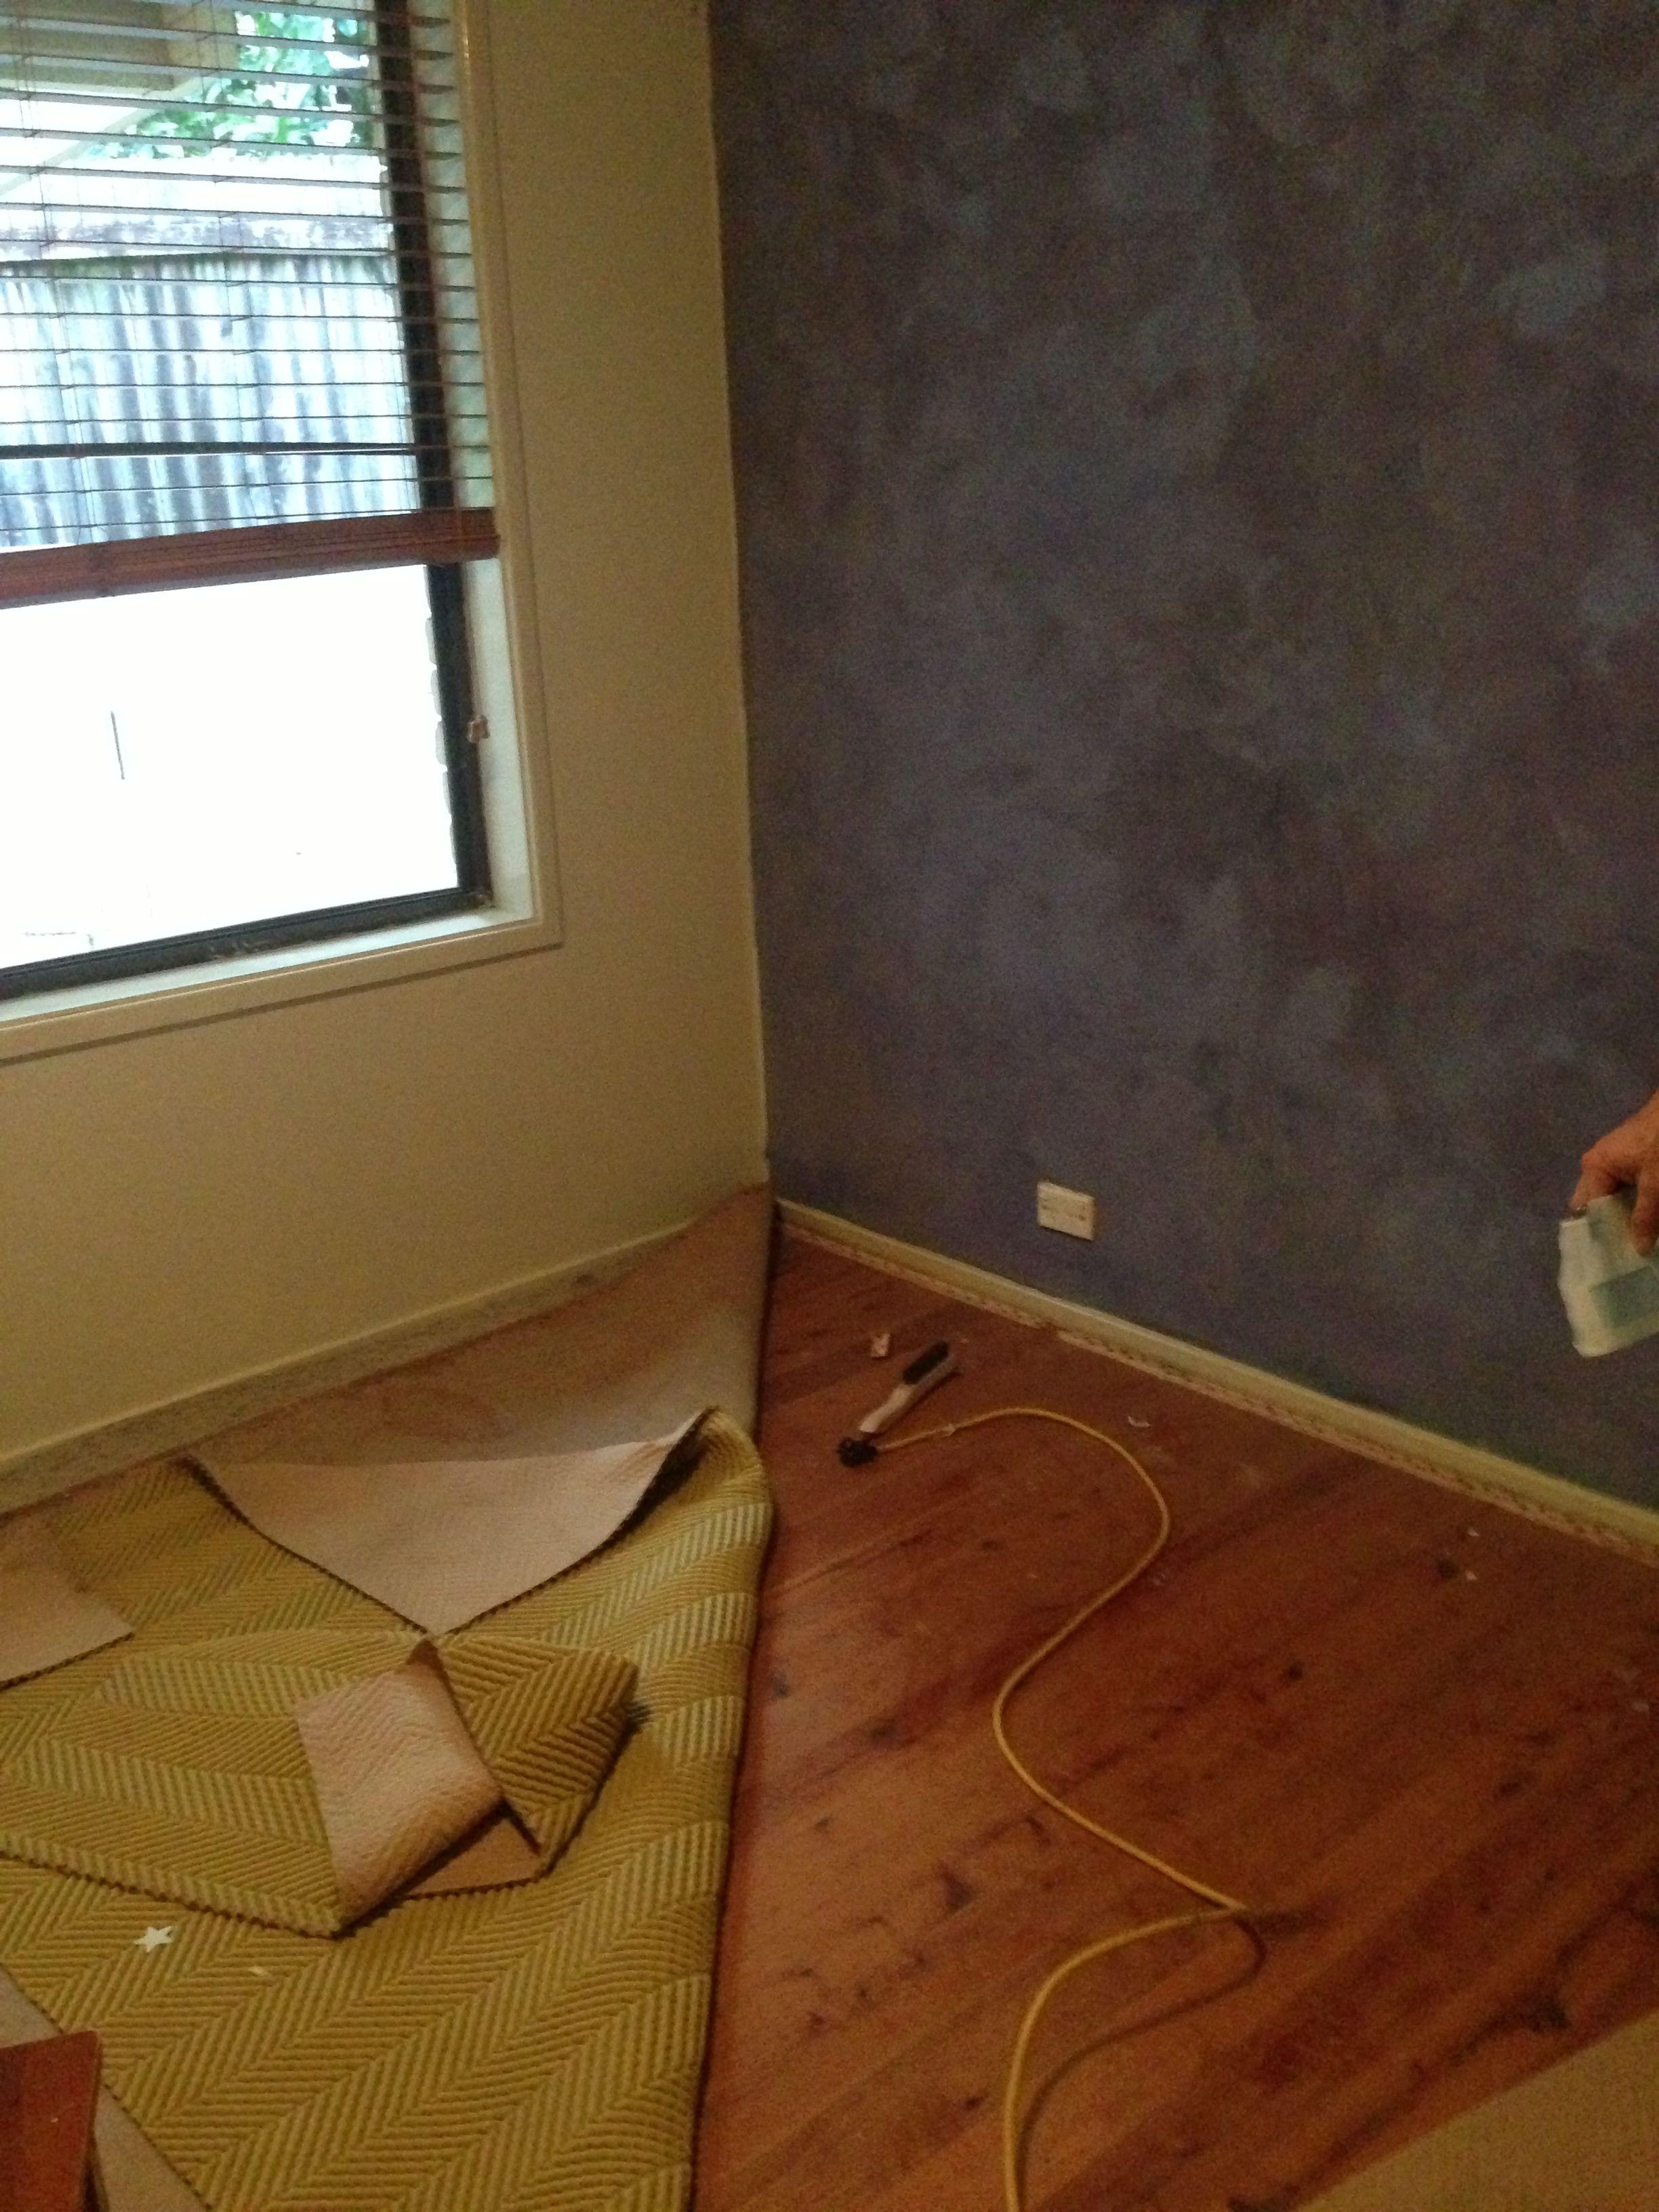 Floor boards Flooring, Home appliances